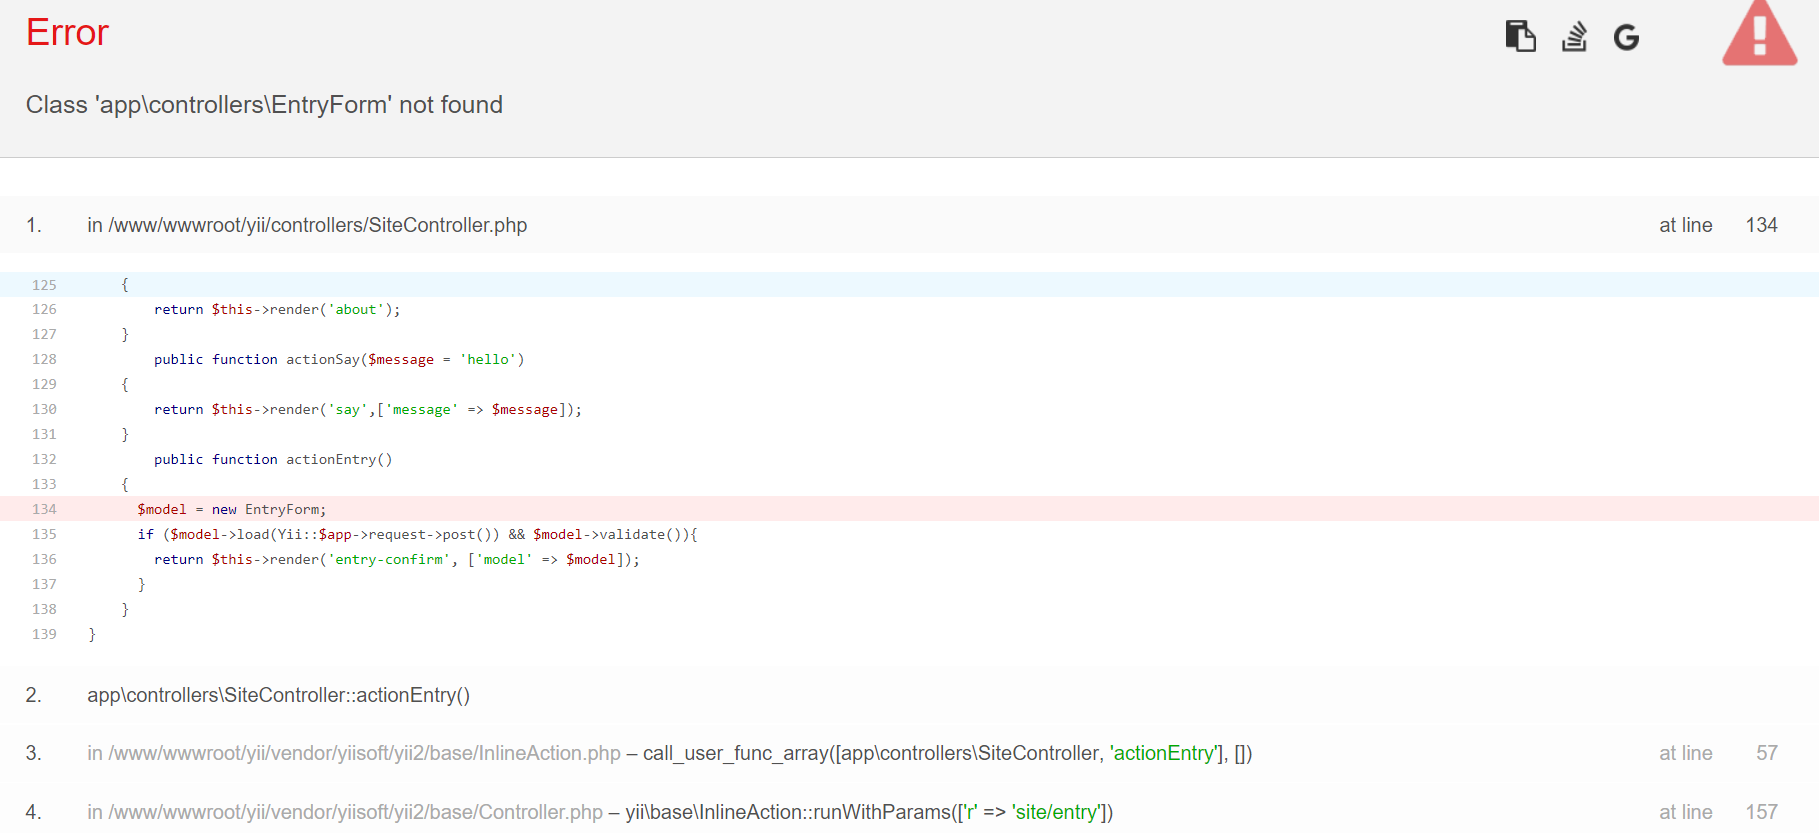 yii\base\ErrorException - Class 'app\controllers\EntryForm' not found